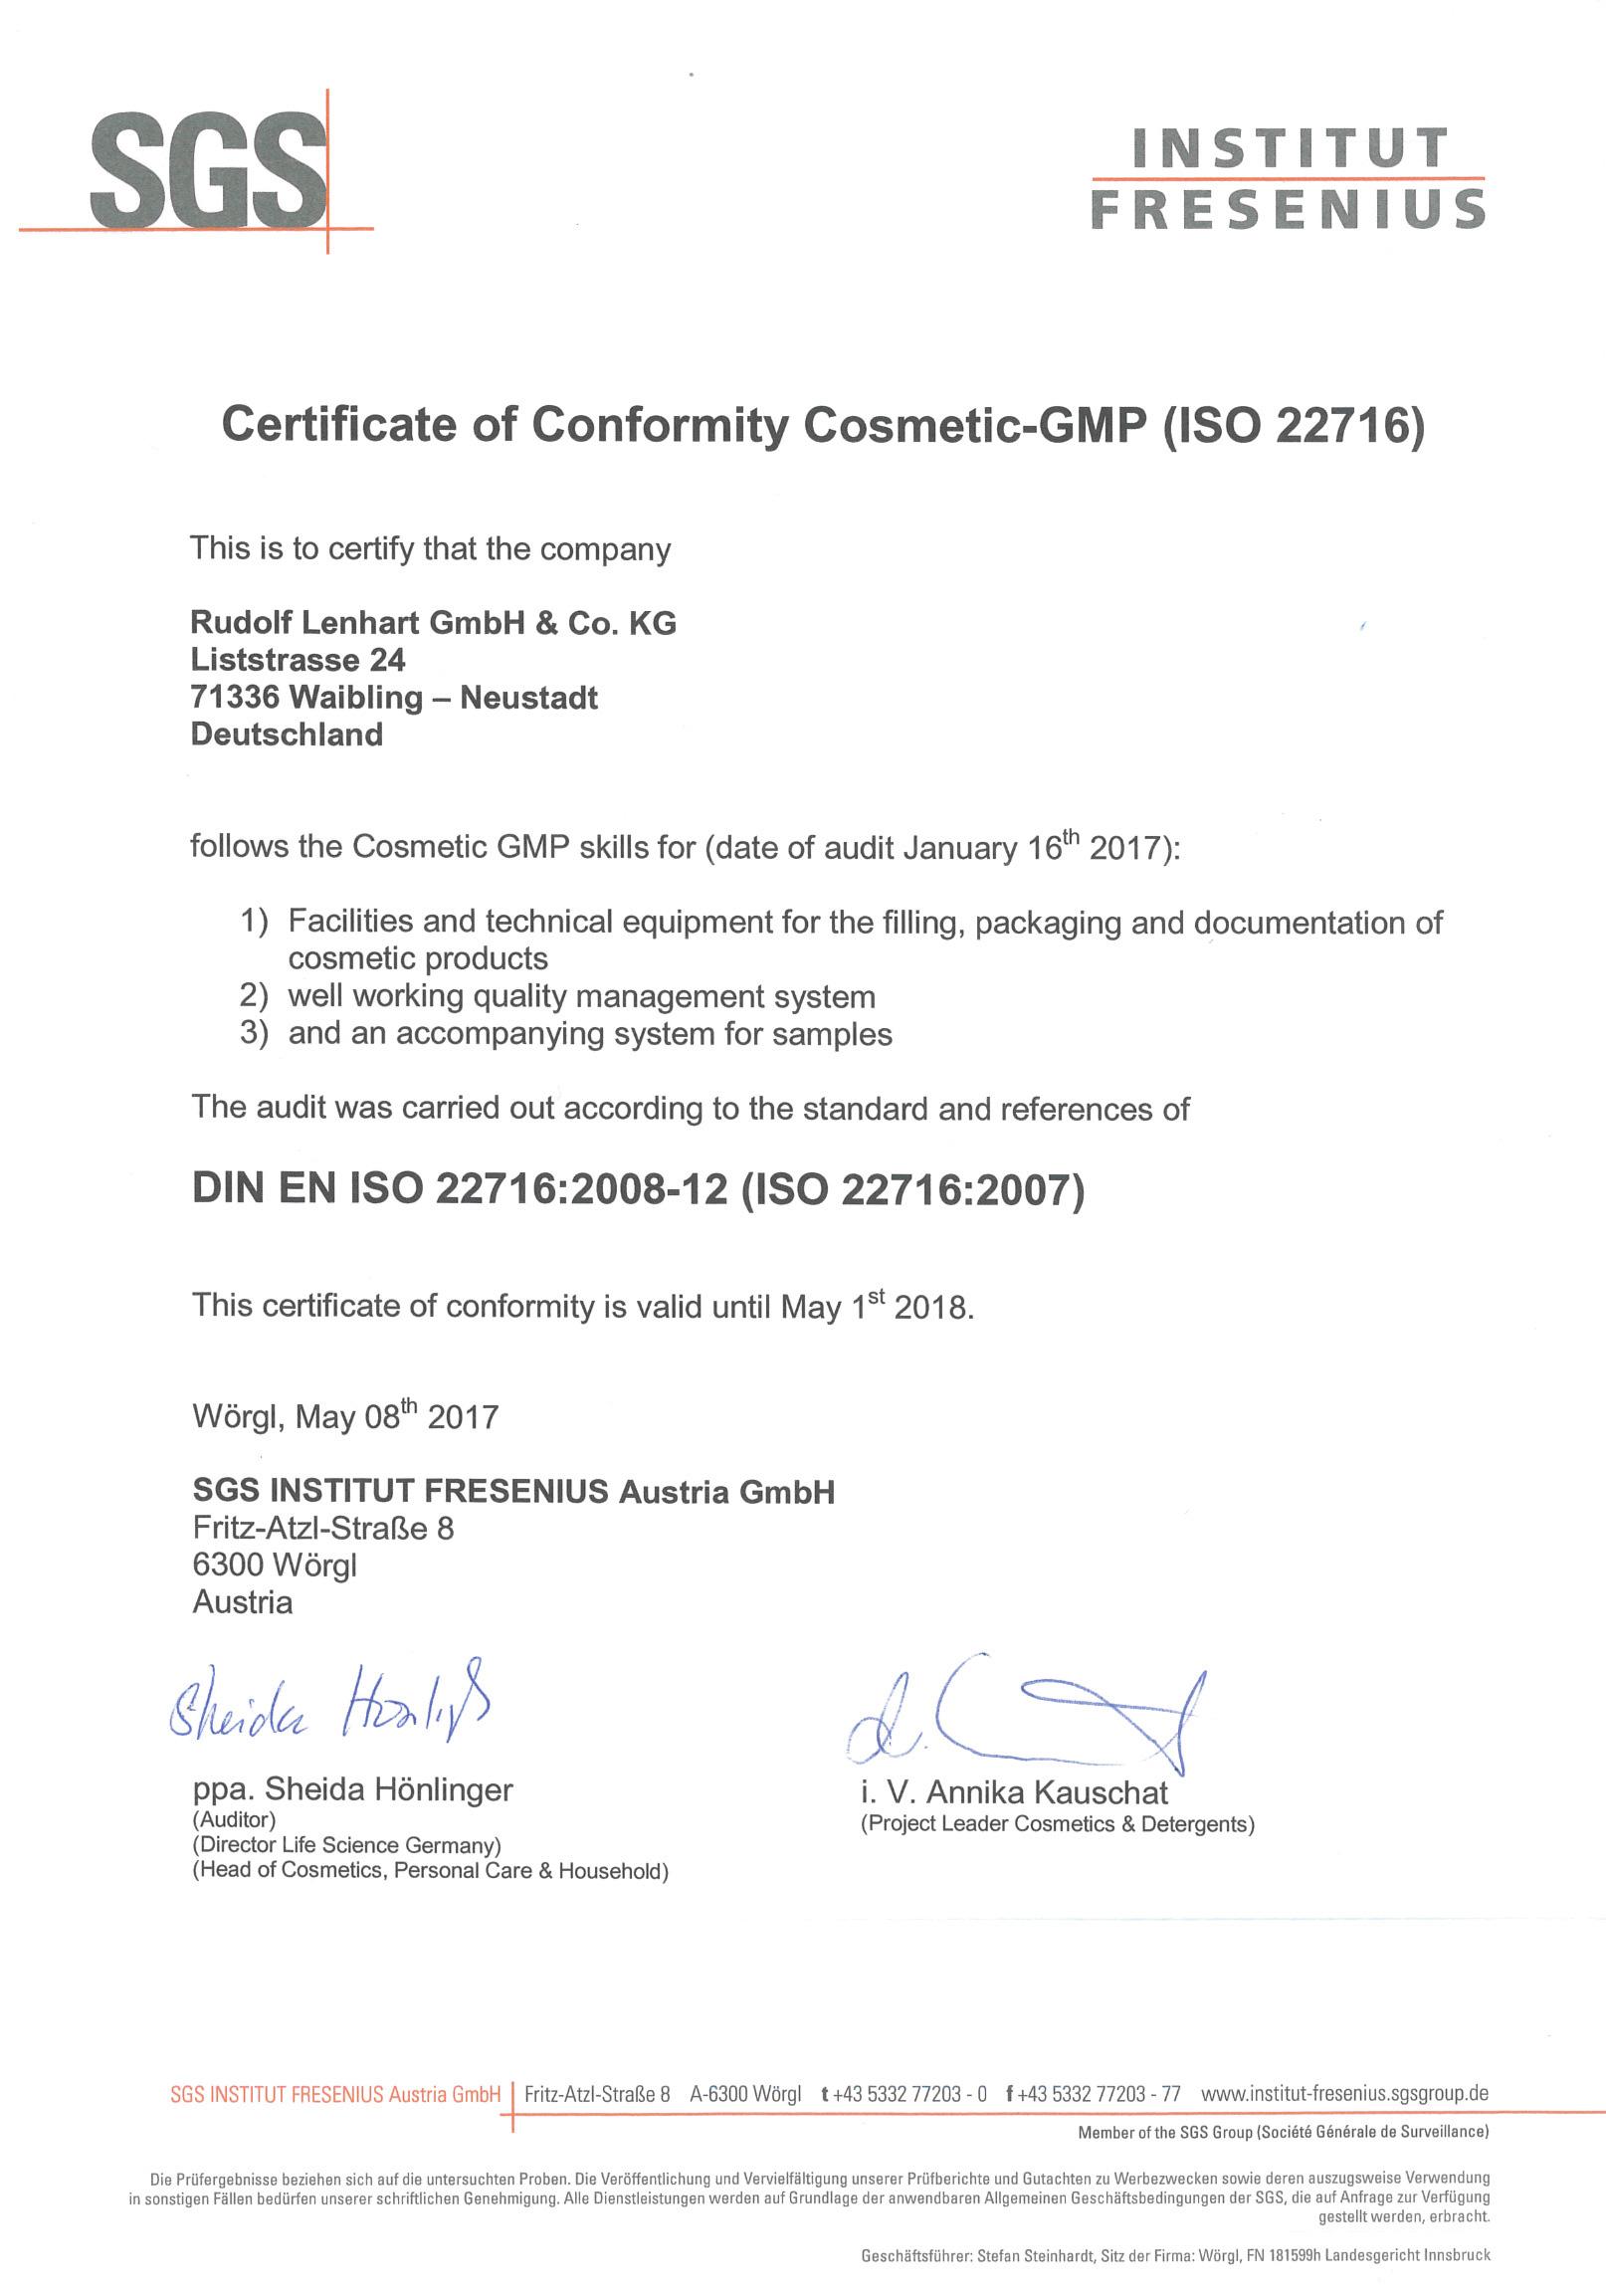 Wunderbar Zertifikat Proben Fotos - zertifizierungsstelle ...